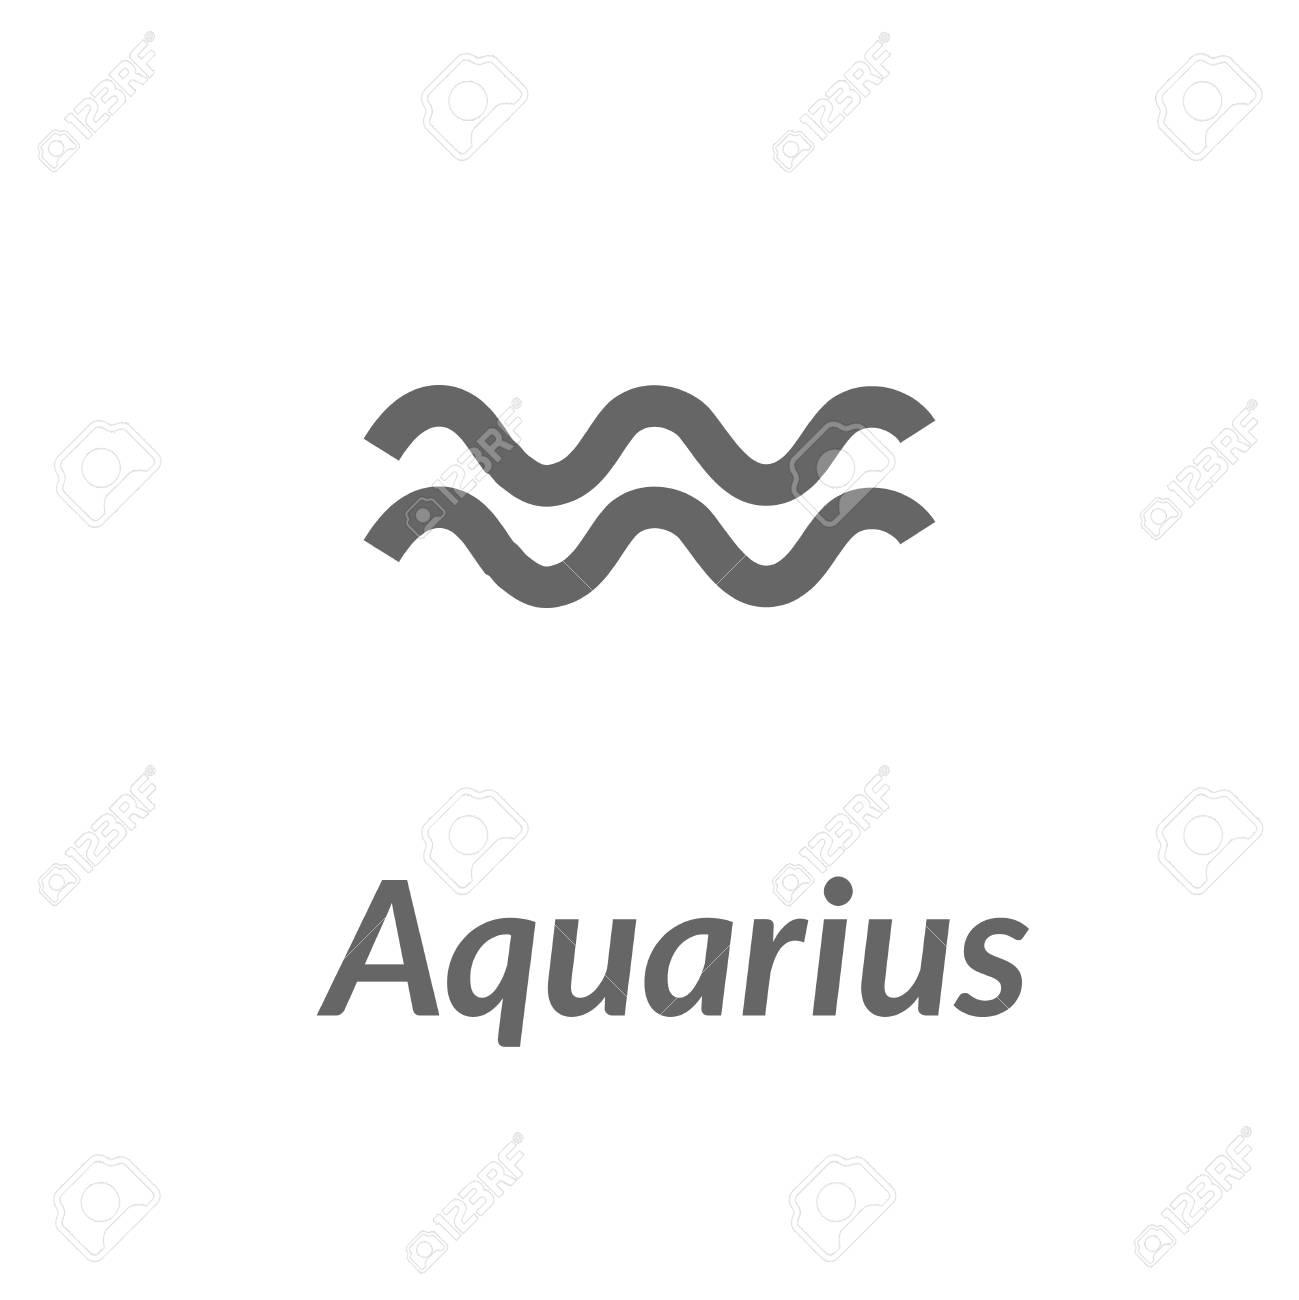 The water bearer aquarius sing star constellation element age the water bearer aquarius sing star constellation element age of aquarius constellation zodiac buycottarizona